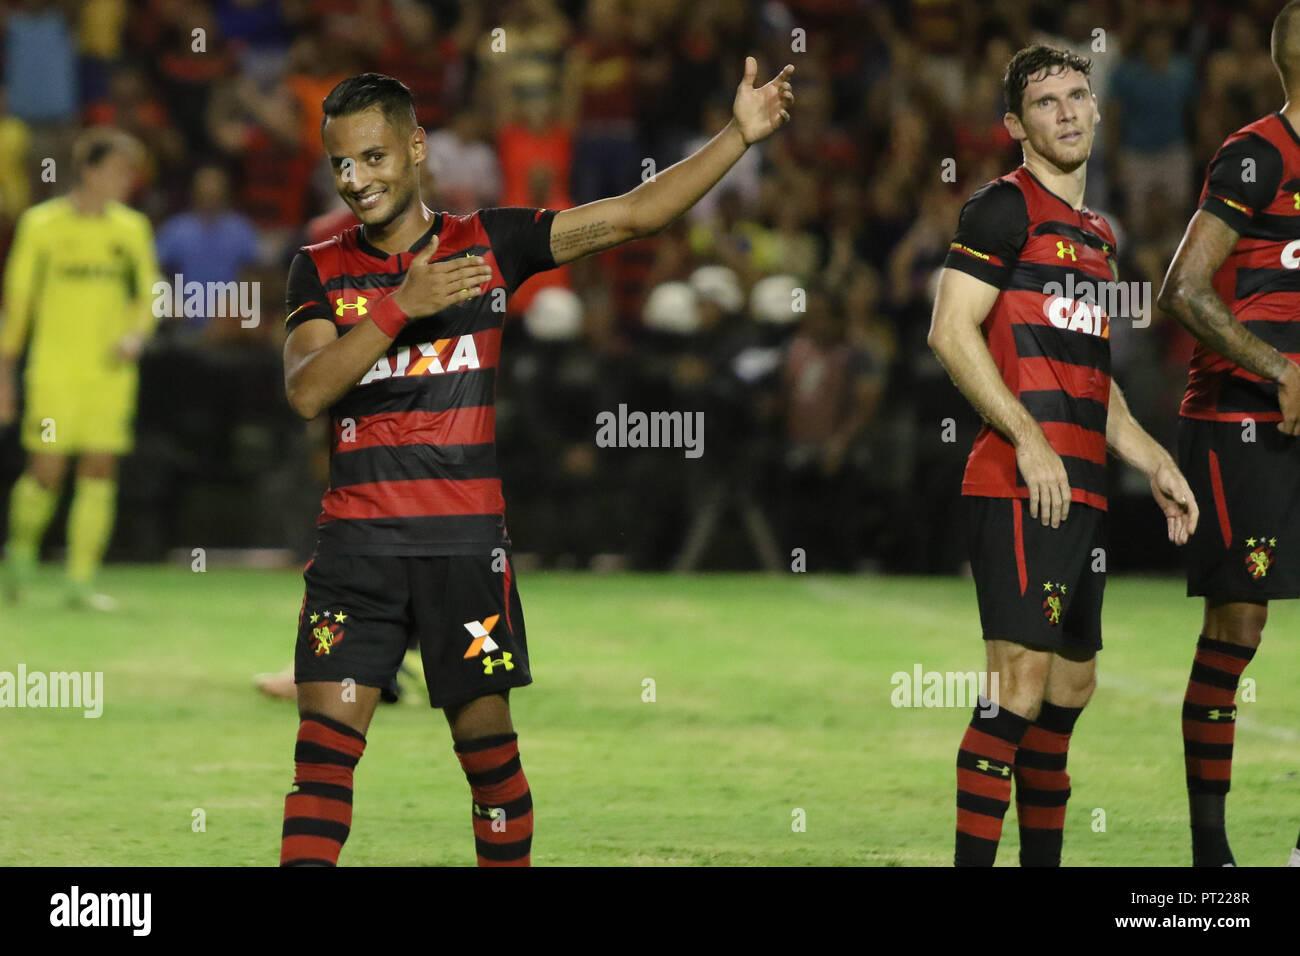 Pe Recife 05 10 2018 Brazilian A 2018 Sport Recife X Internacional Rs During A Match